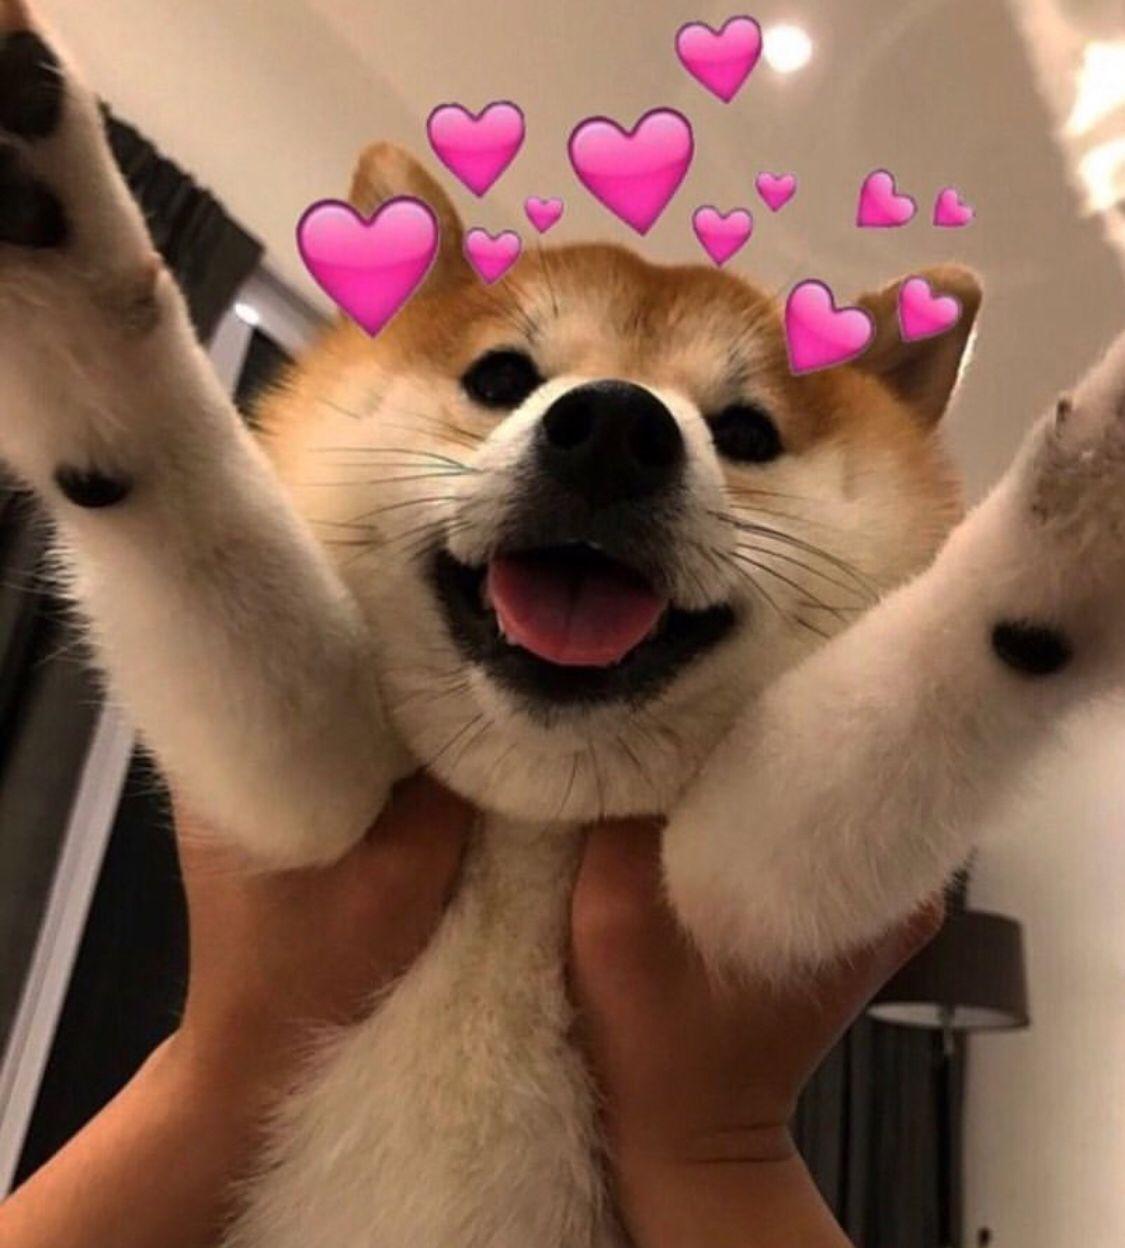 ʚ ɞ Follow Me For More Portialina ʚ ɞ Also Go Sub To My Channel Link In Bio ʚ ɞ Cute Love Memes Cat Memes Cute Dogs